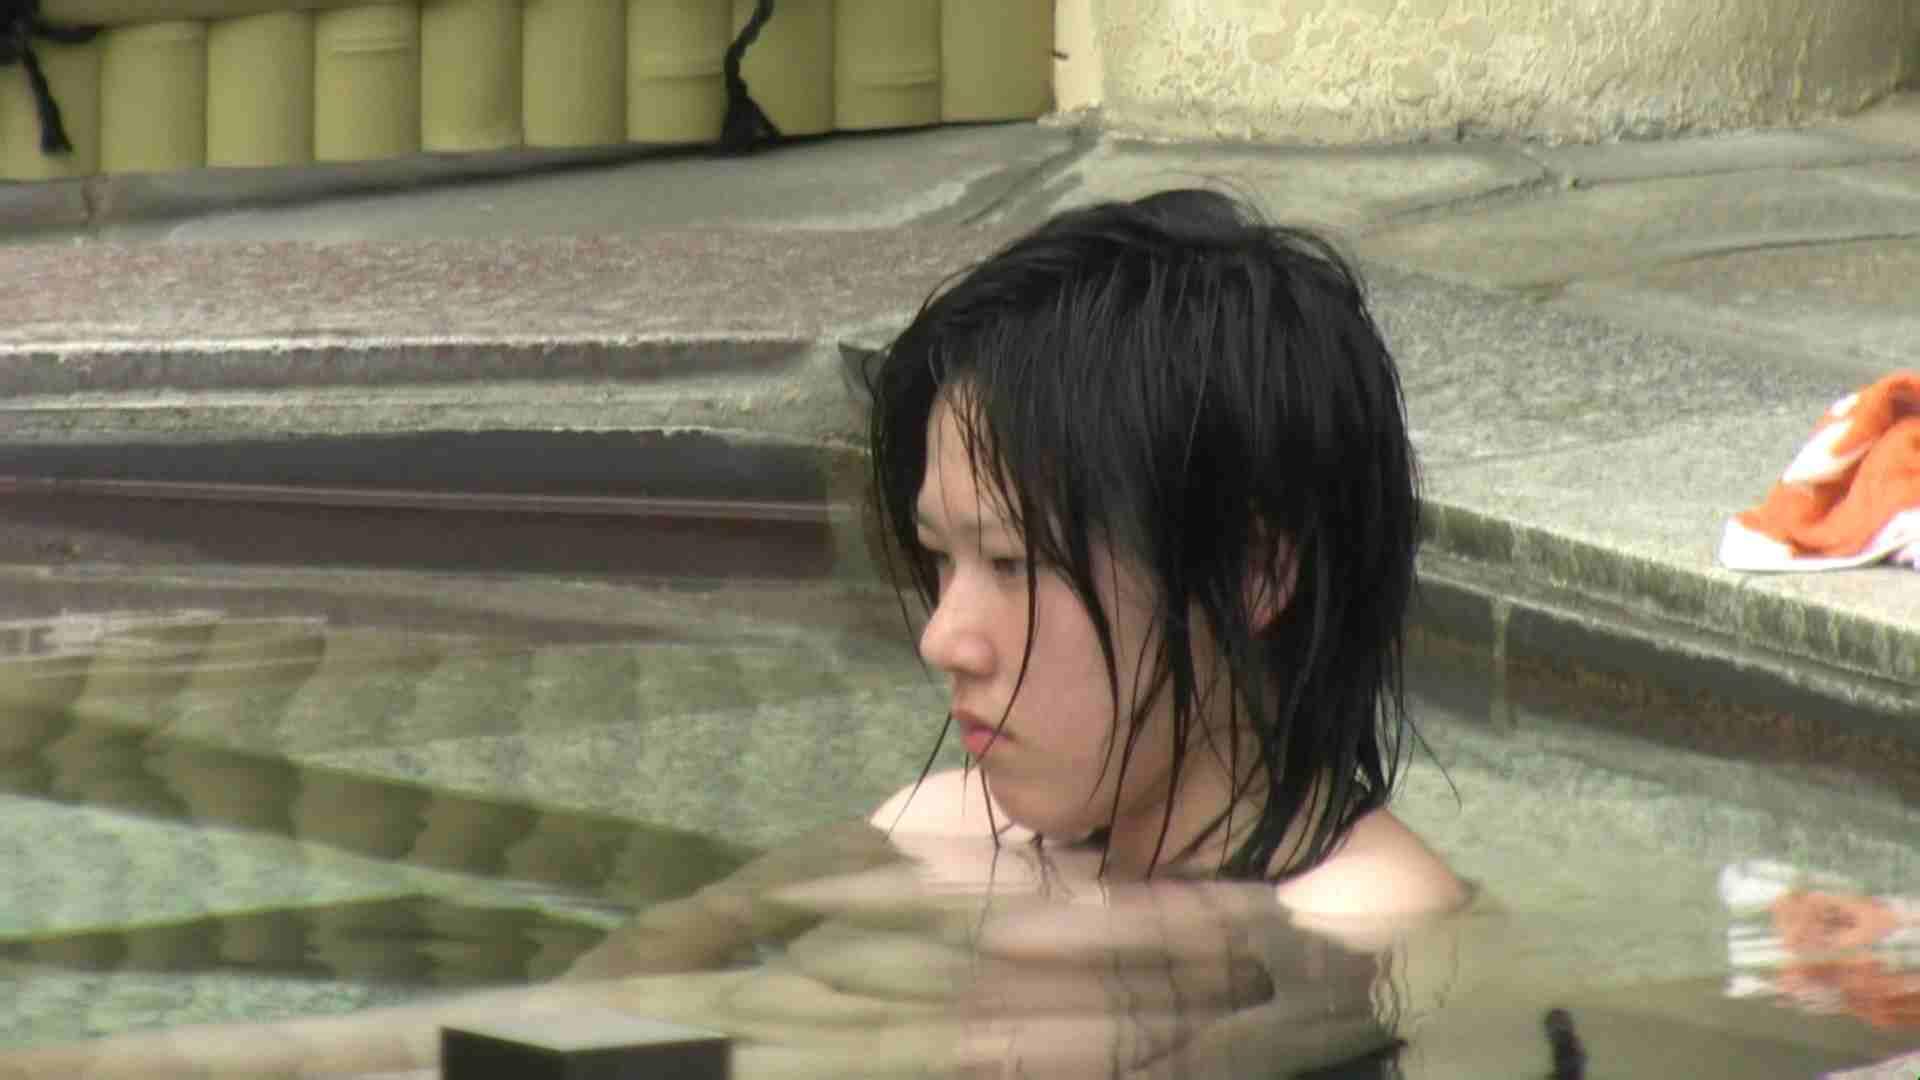 Aquaな露天風呂Vol.36 盗撮シリーズ   露天風呂編  99PIX 53